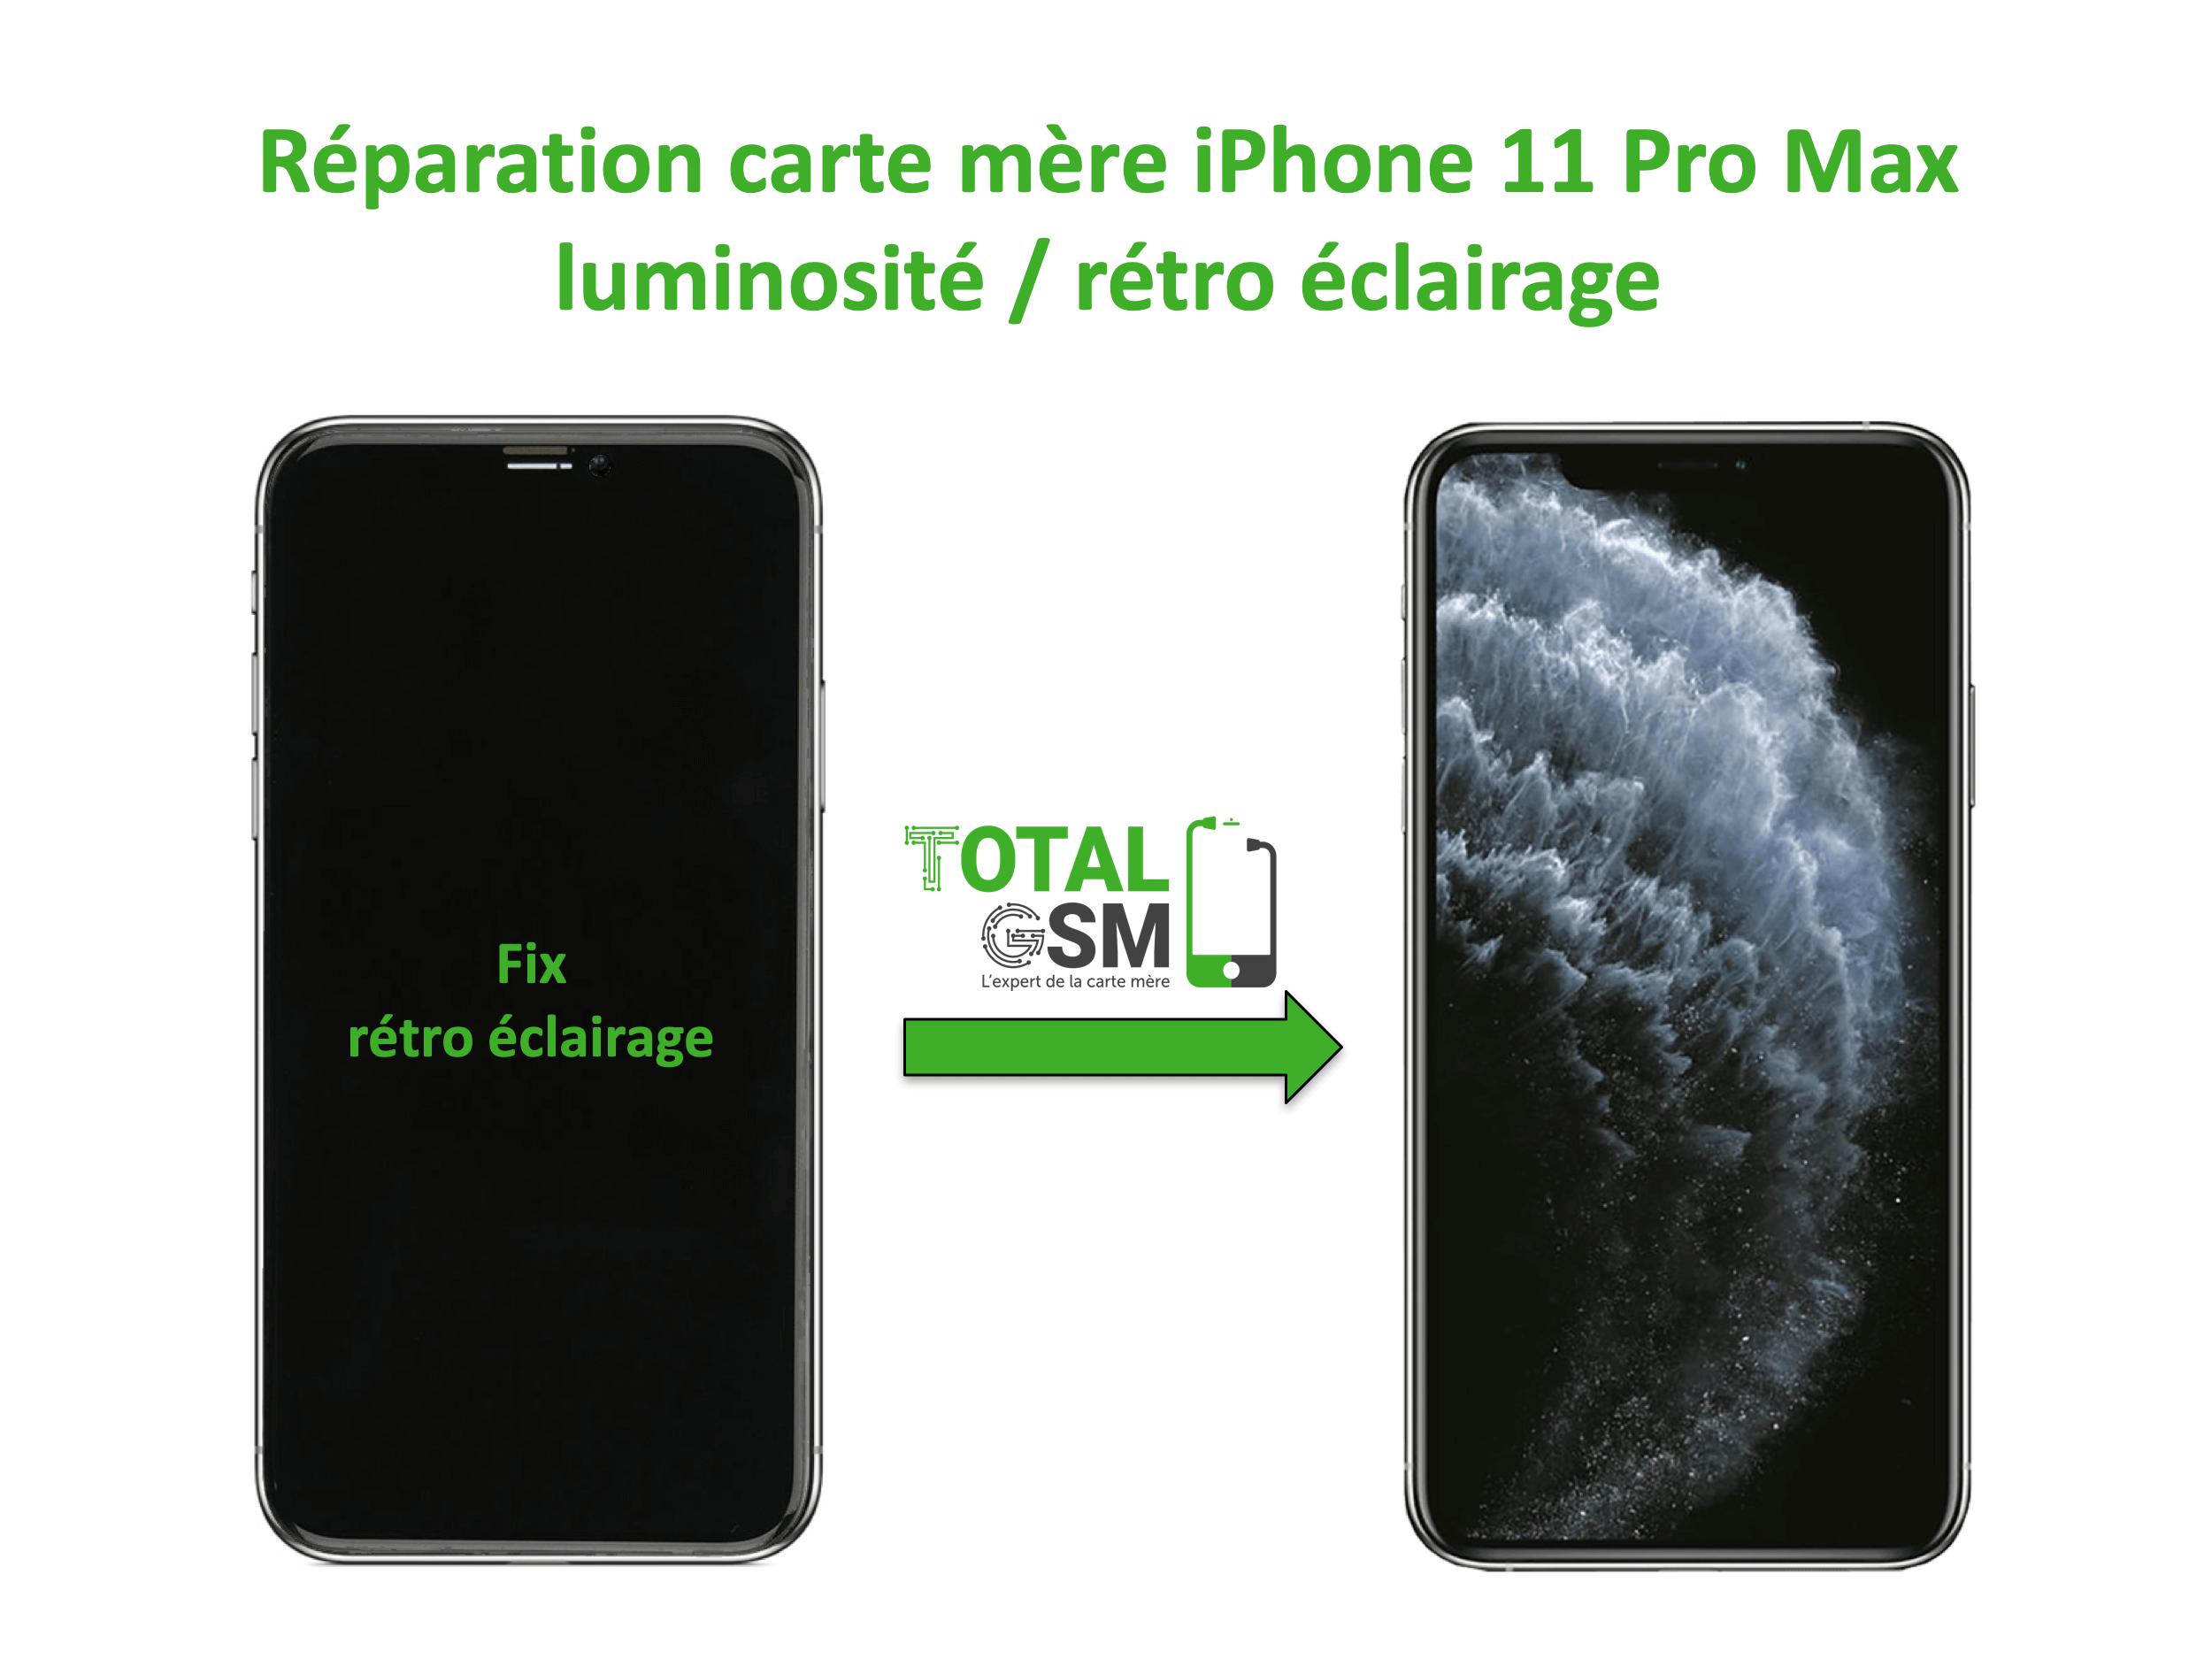 iPhone-11-pro-max-reparation-probleme-de-retro eclairage